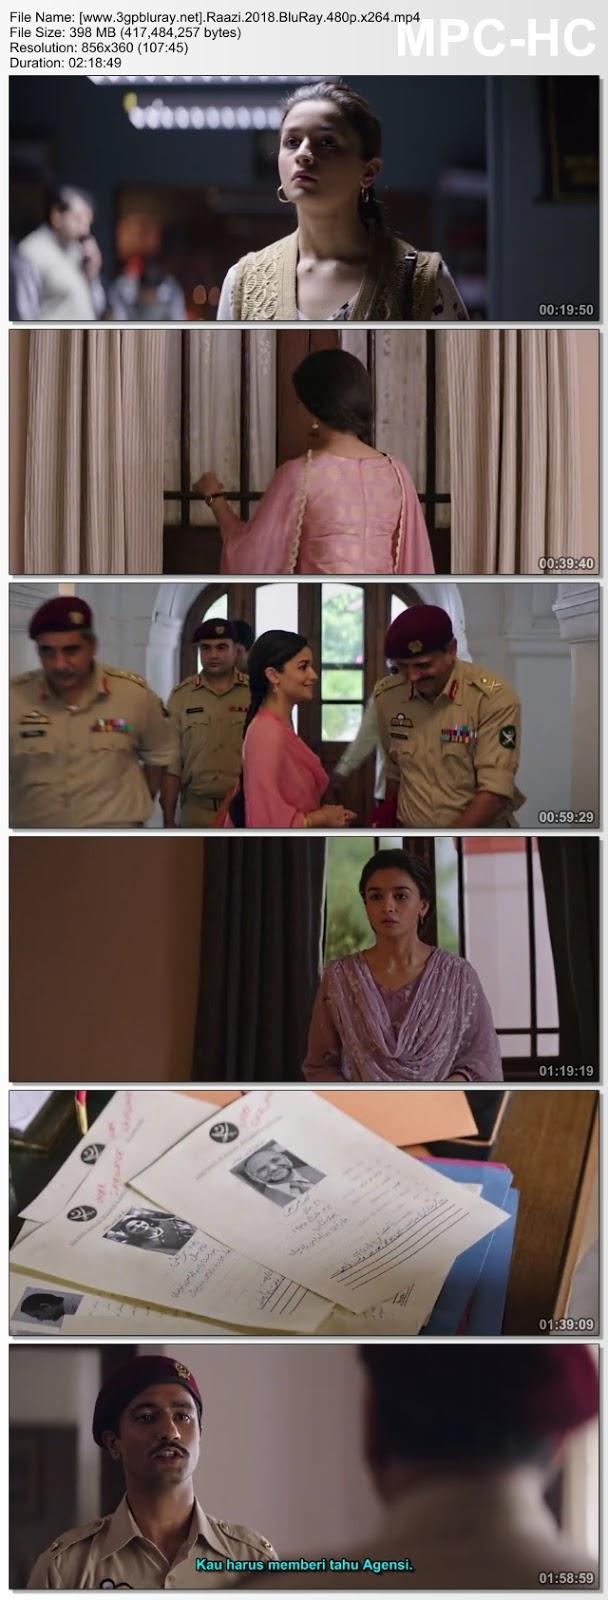 Screenshots Download Raazi (2018) BluRay 480p & 3GP Subtitle Indonesia